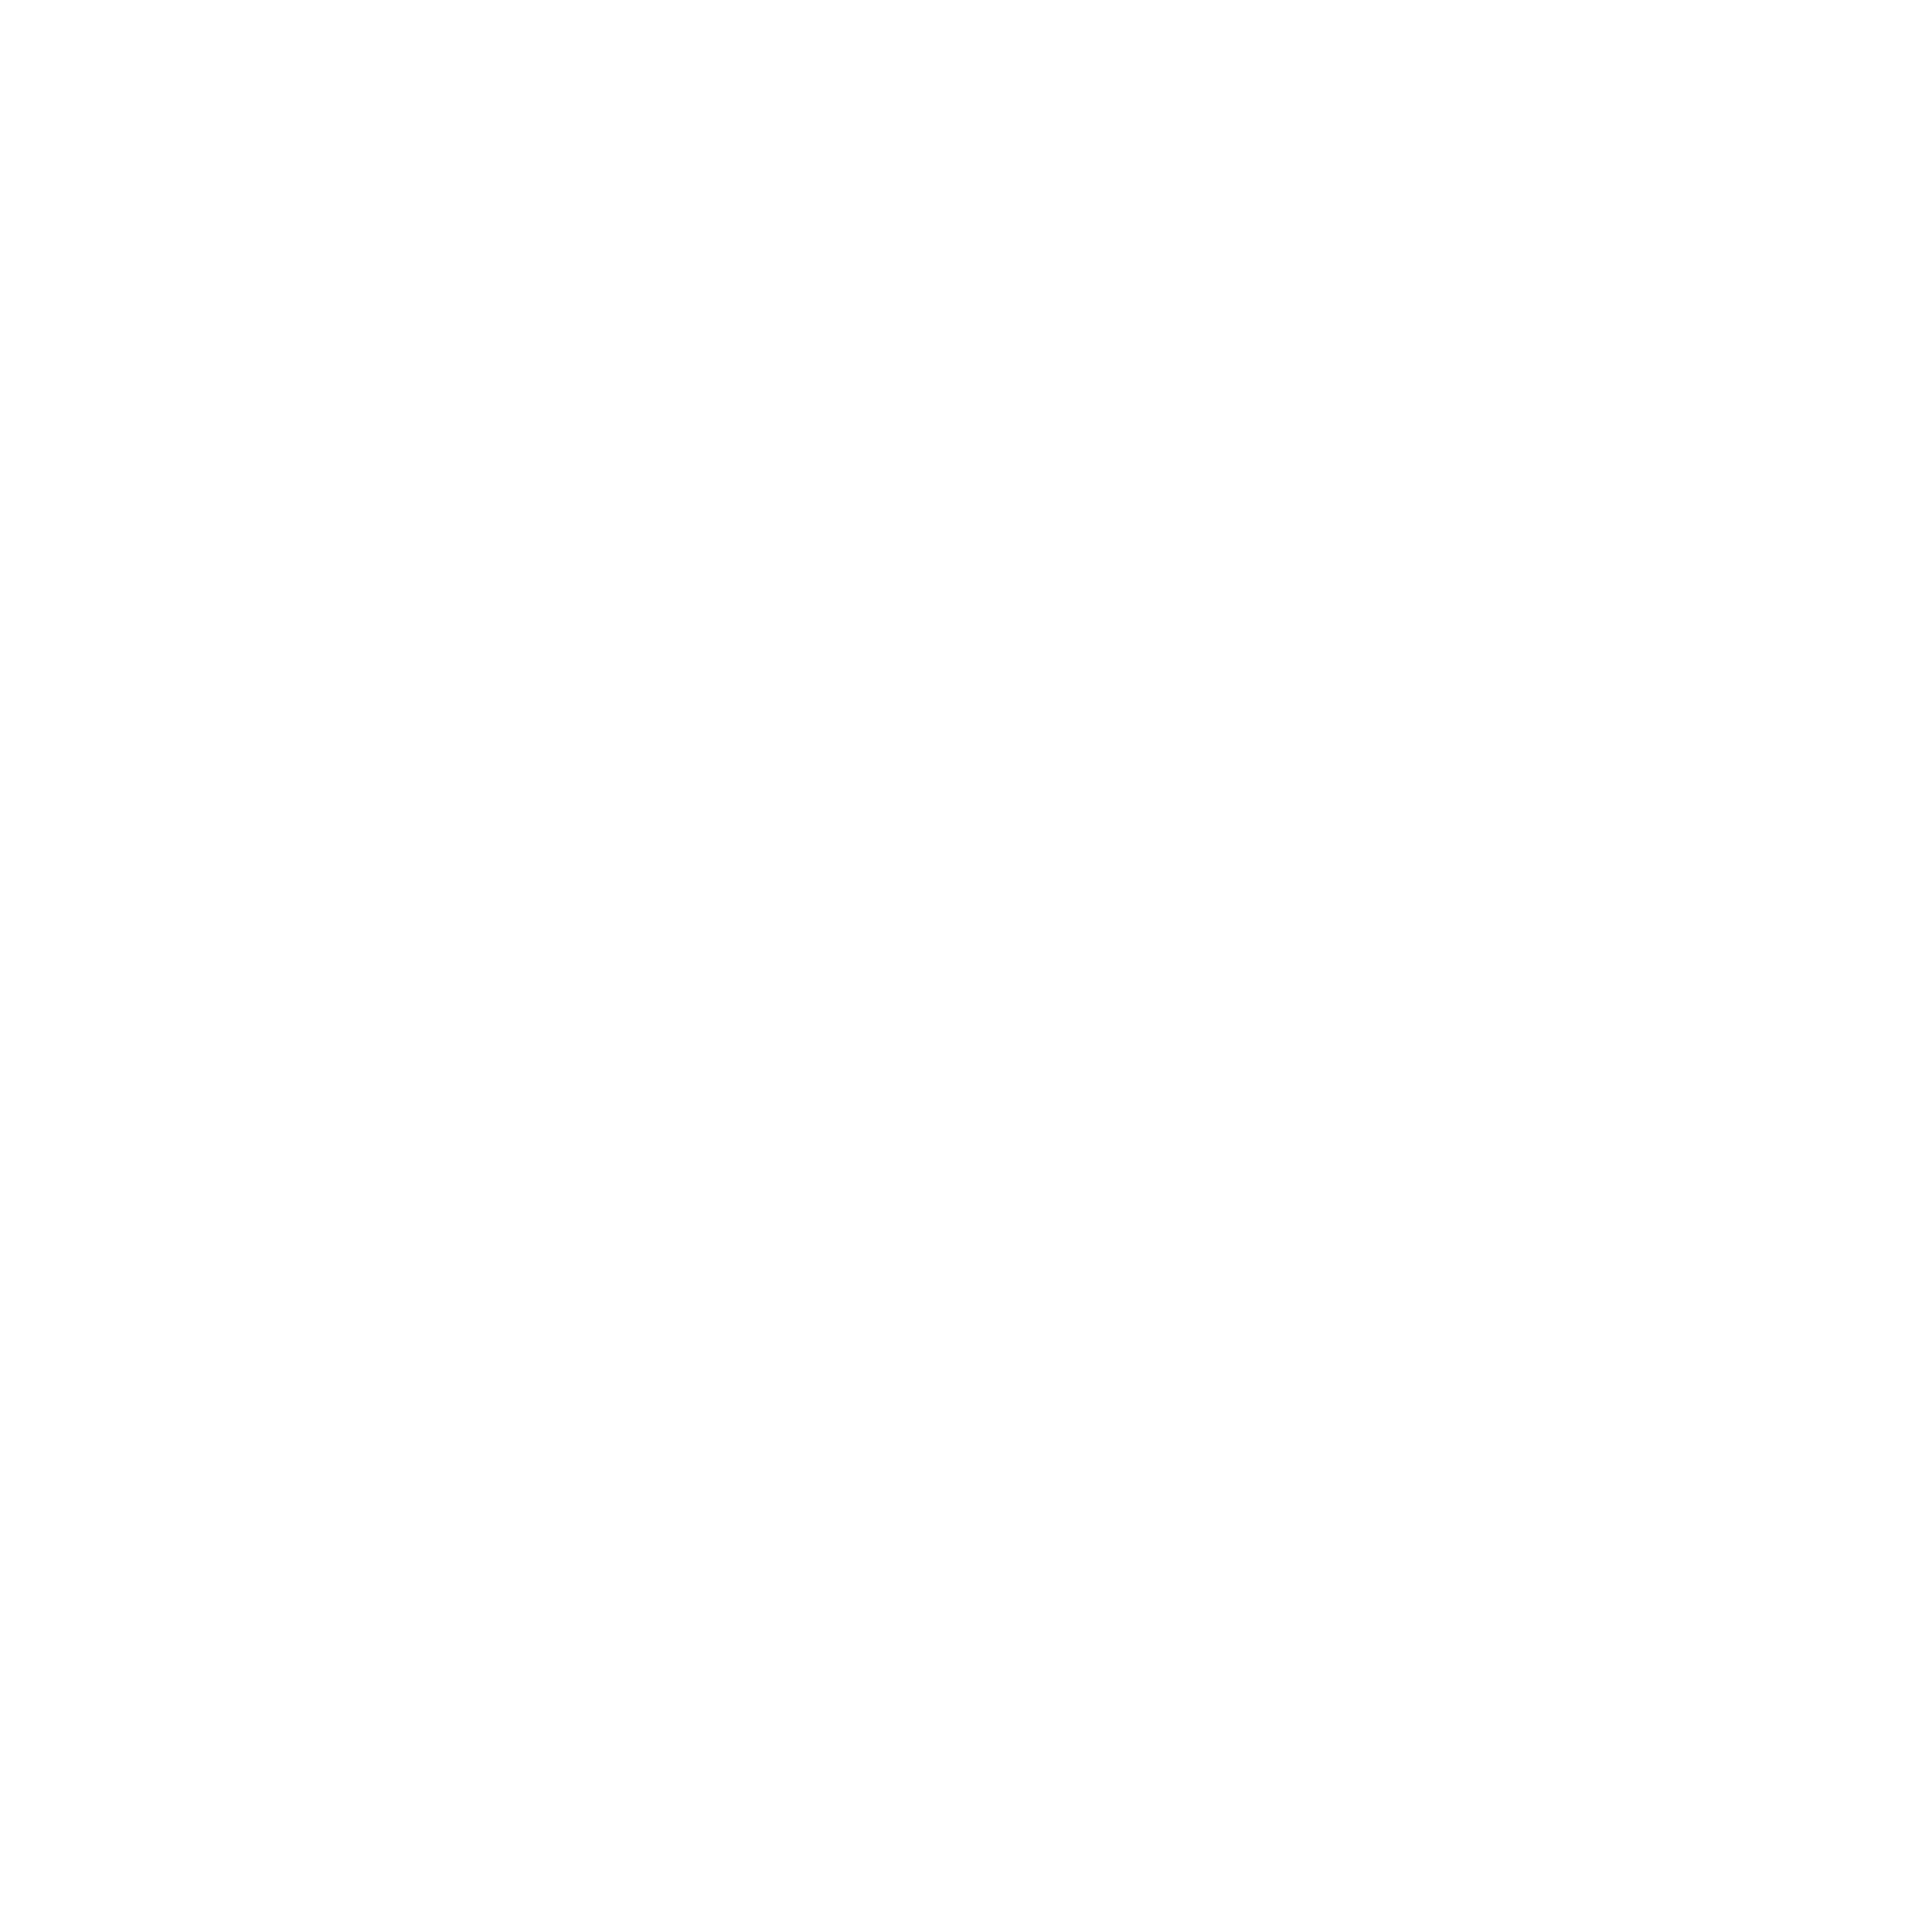 Publo's Royal Christian School